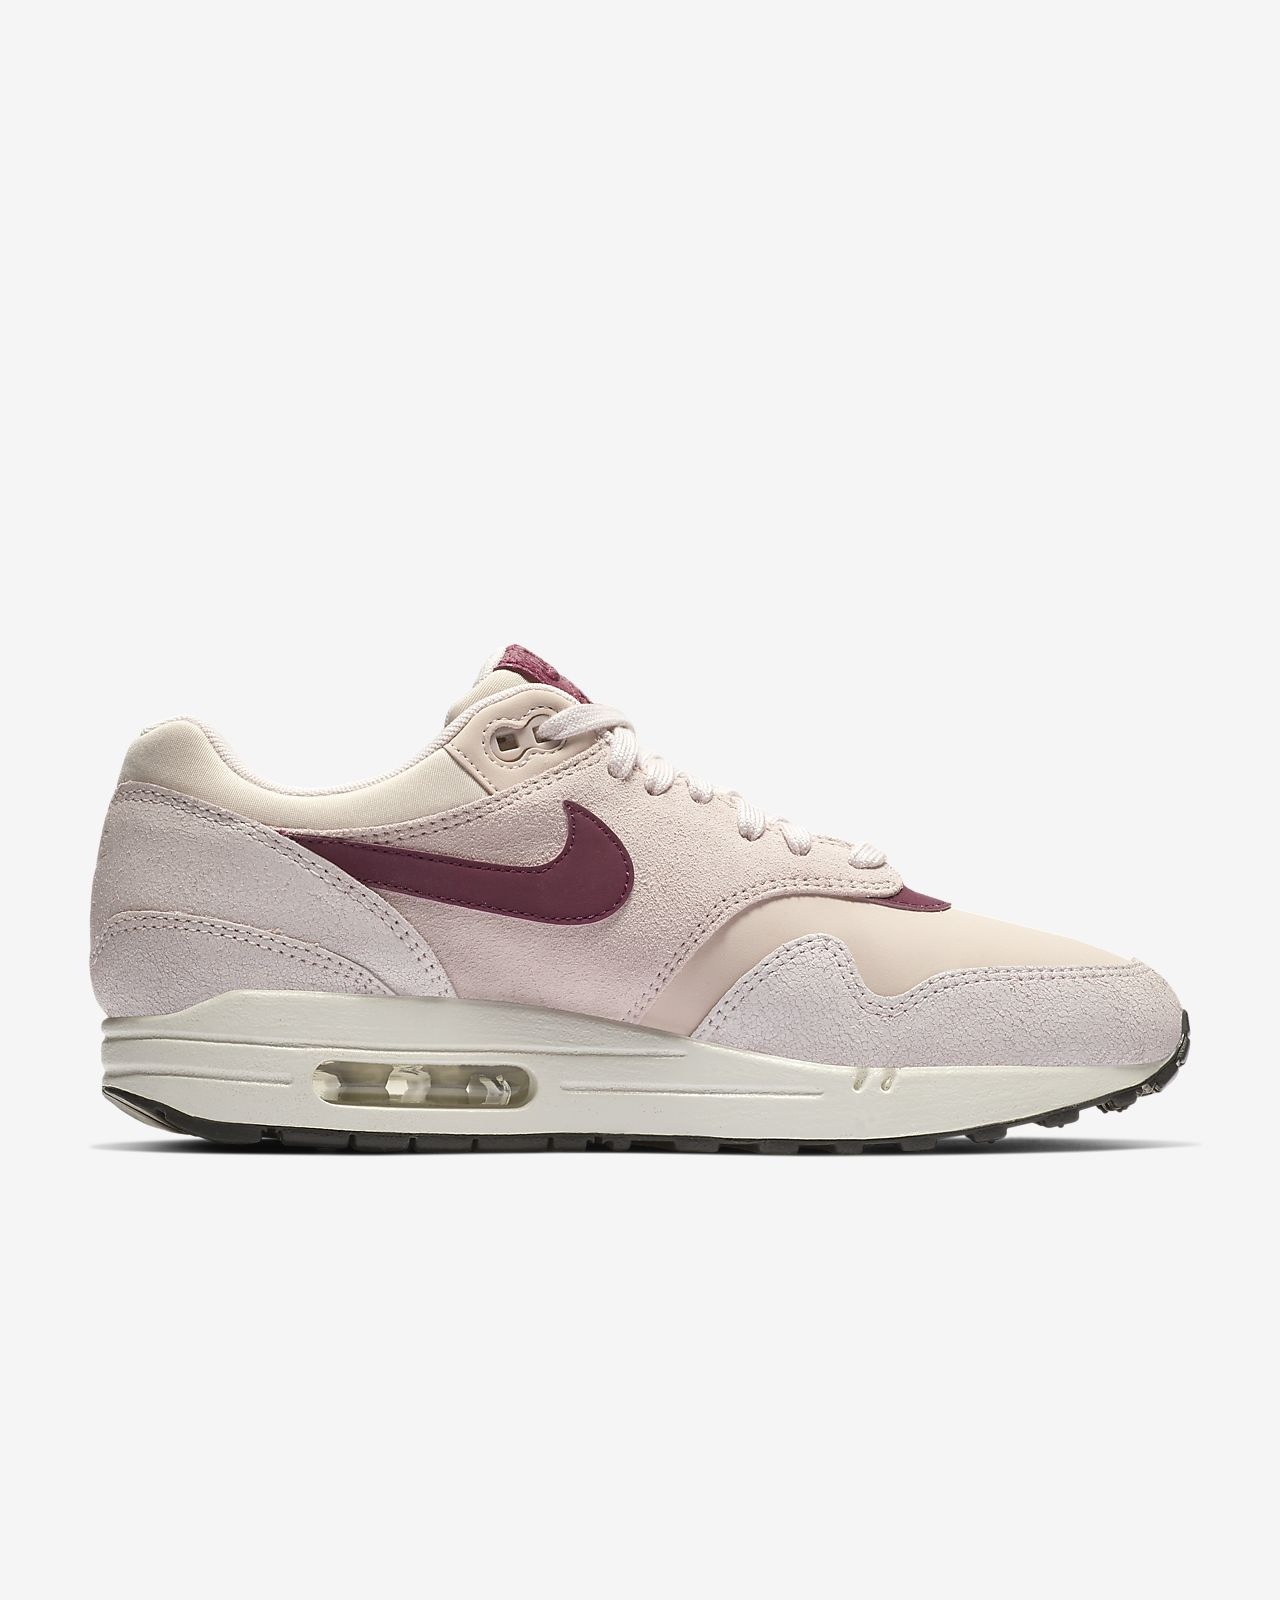 half off fcd21 cecfd ... Nike Air Max 1 Premium Women s Shoe